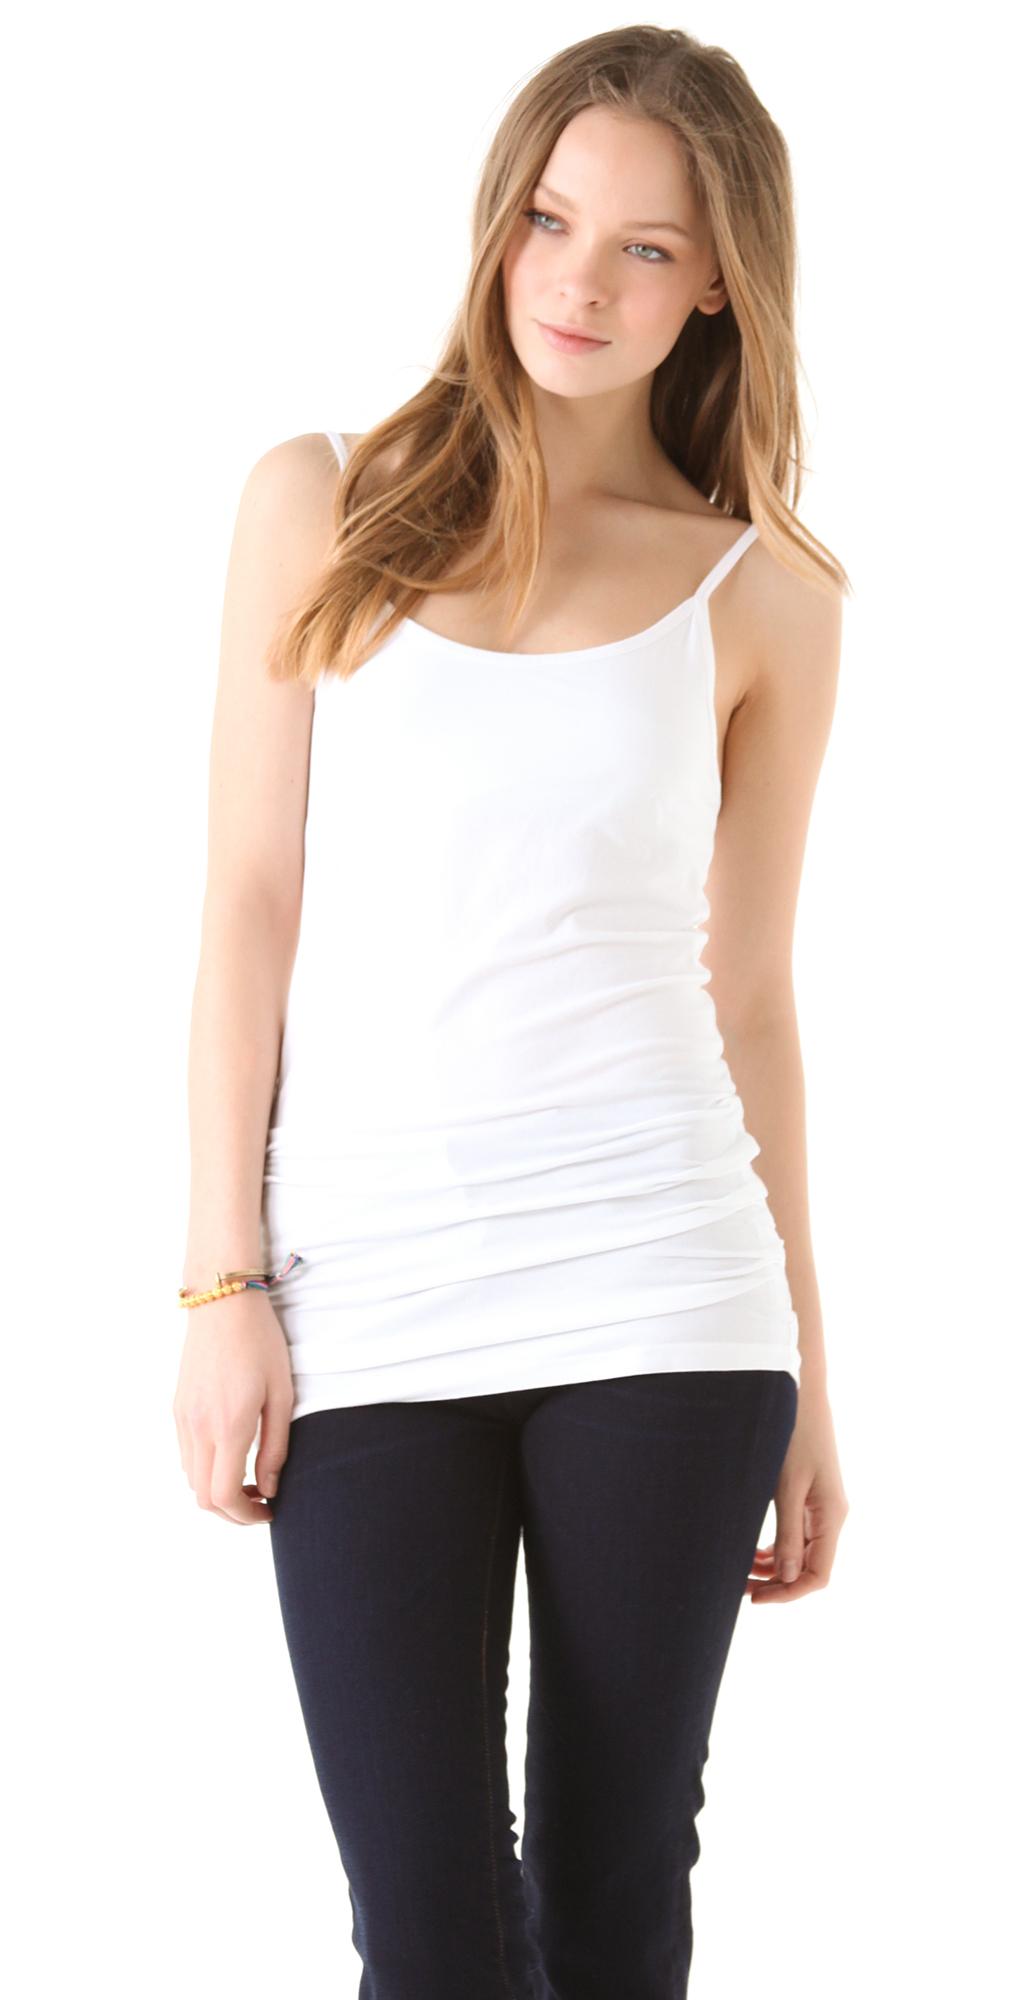 PACT Women's Everyday Organic Cotton Shelf-Bra Camisole